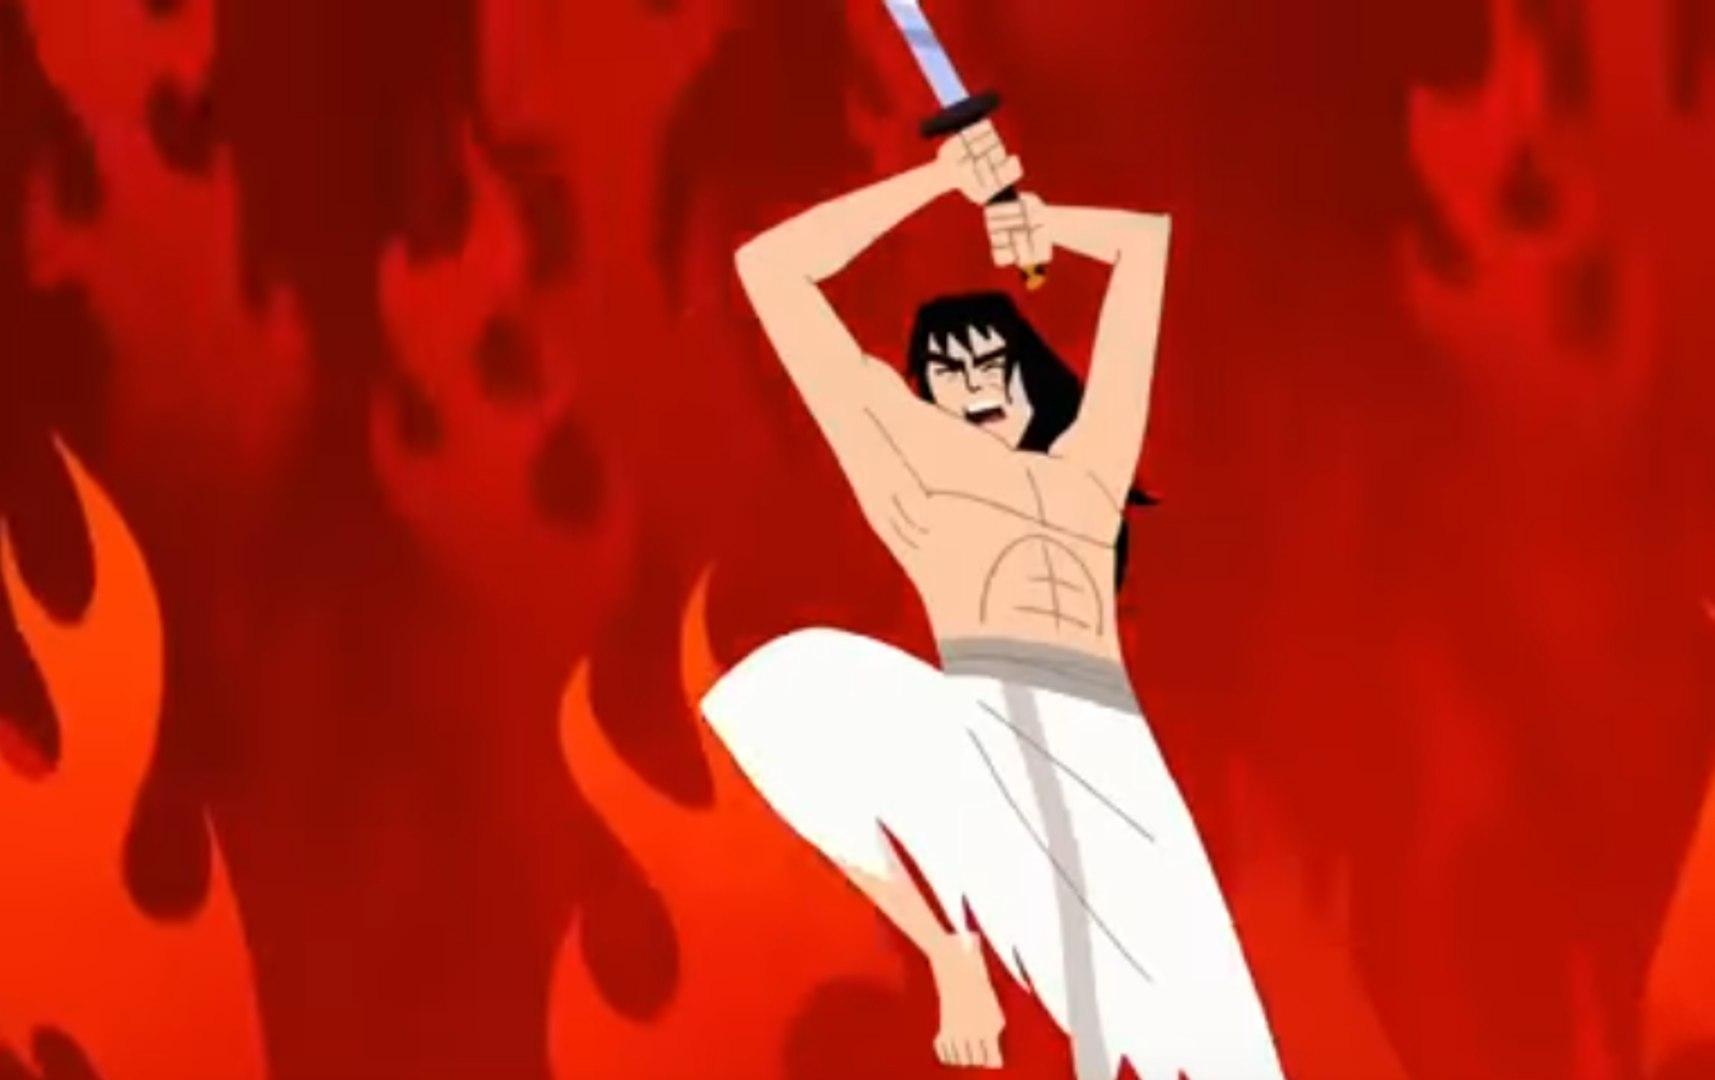 Samurai Jack Season 6 Episode 2 : Episode 2 Free Watch Online,